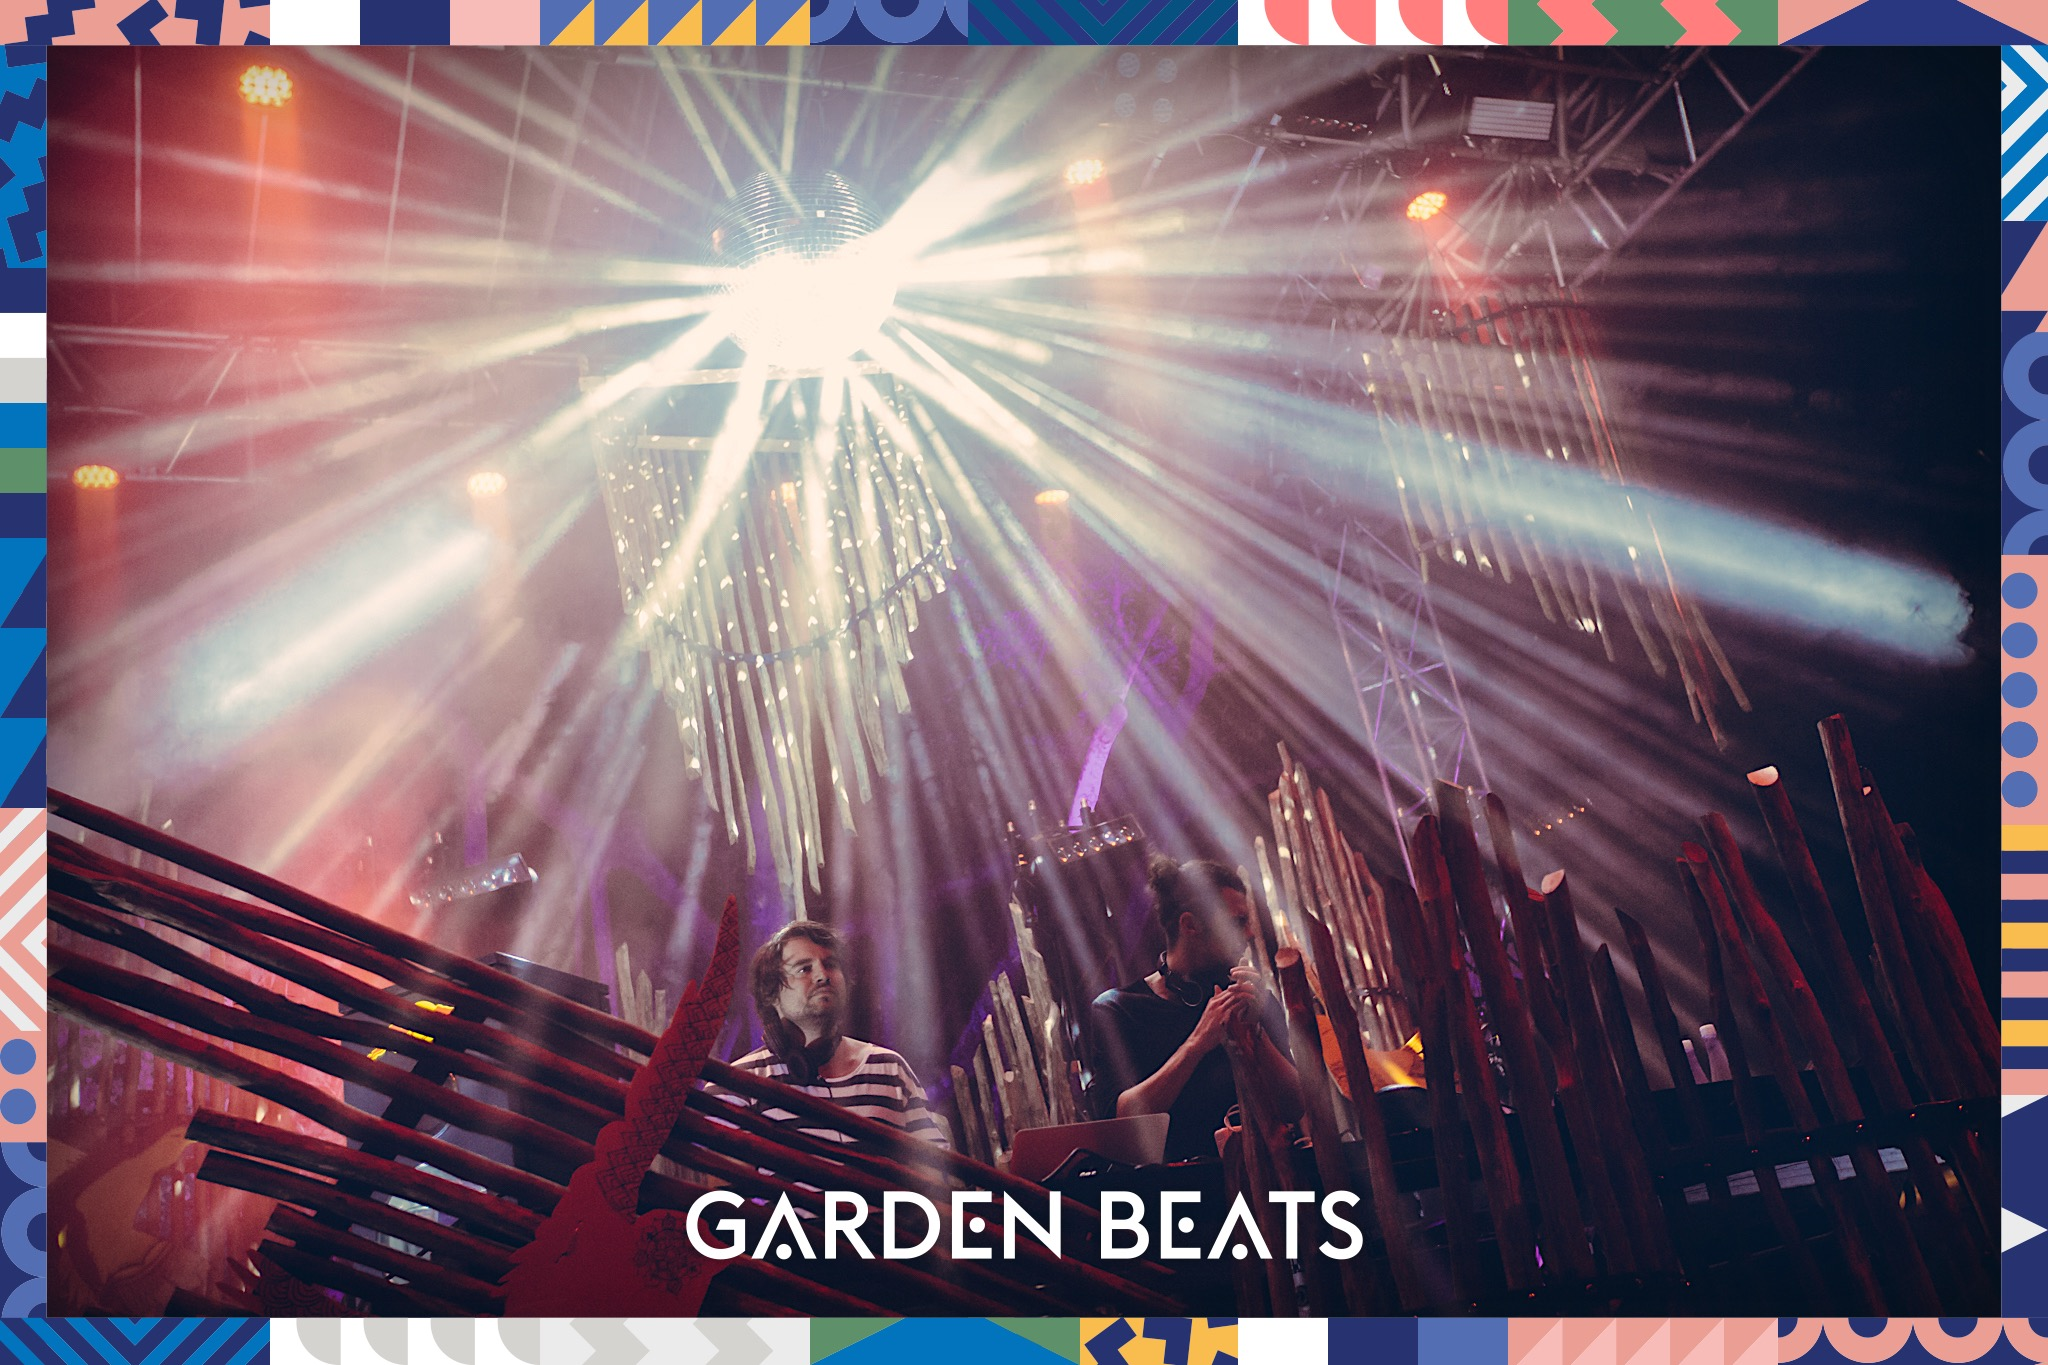 18032017_GardenBeats_Colossal848_WatermarkedGB.jpg